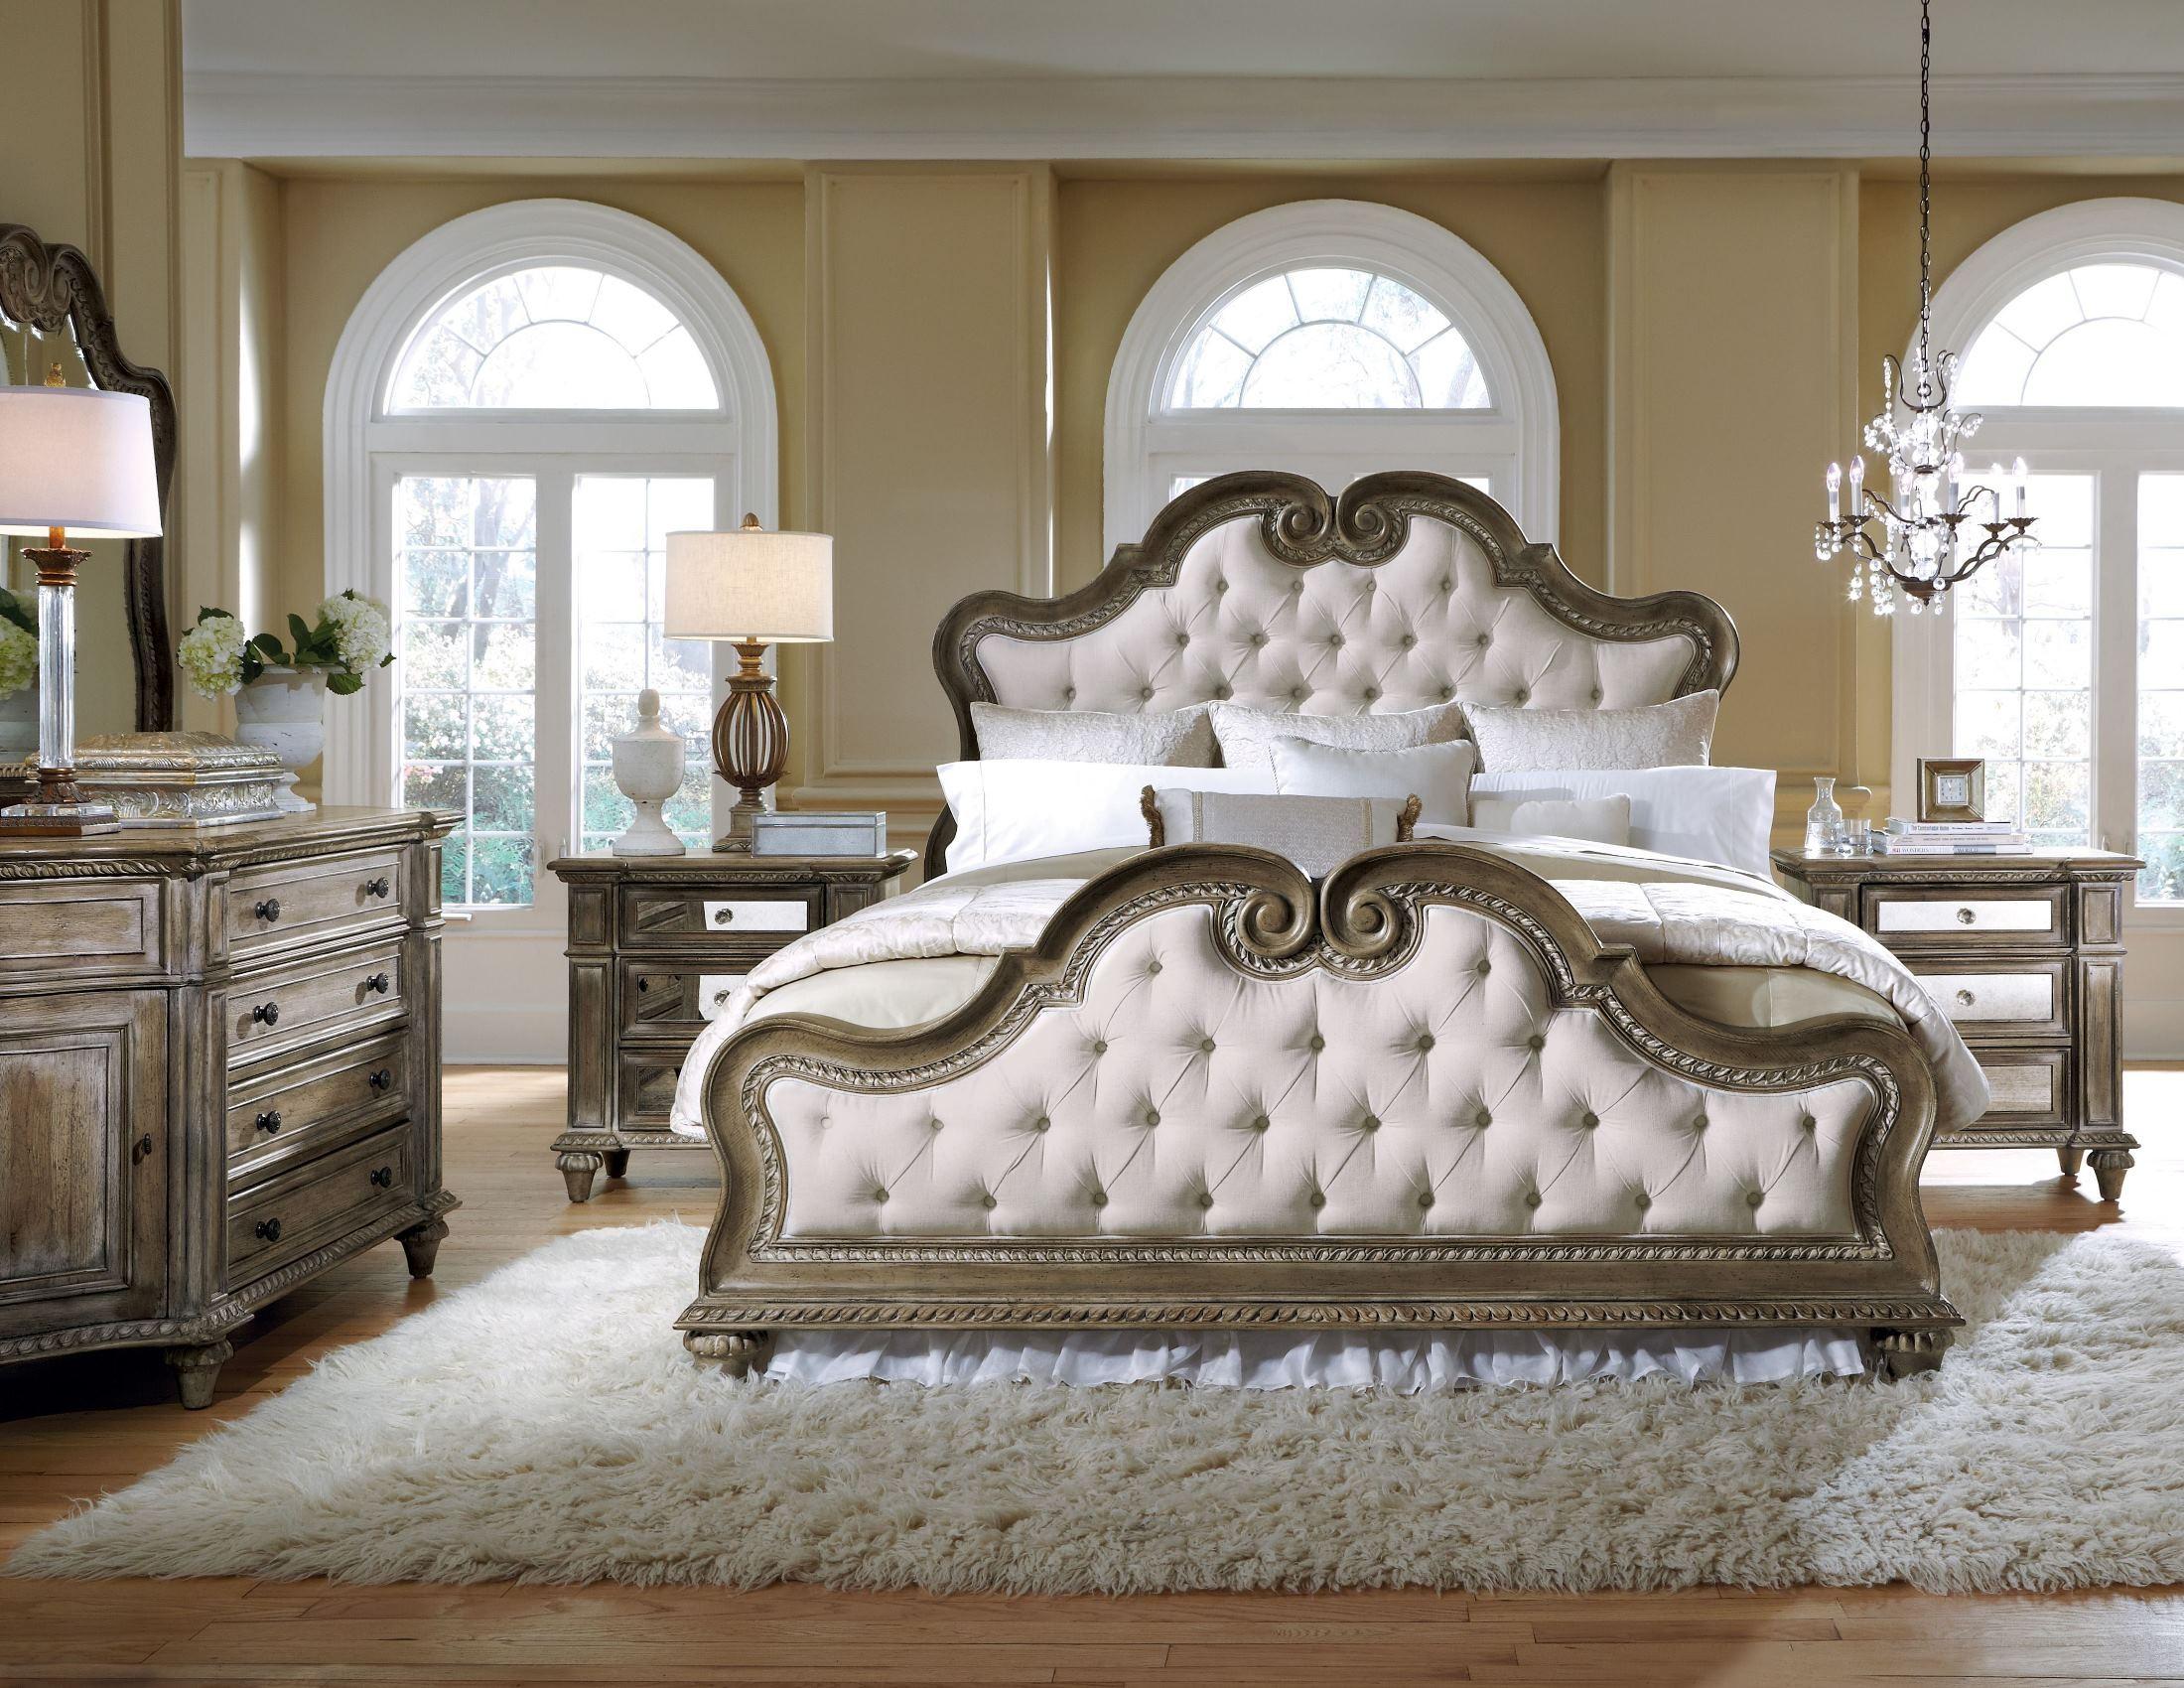 arabella upholstered bedroom set from pulaski (  - arabella upholstered bedroom set